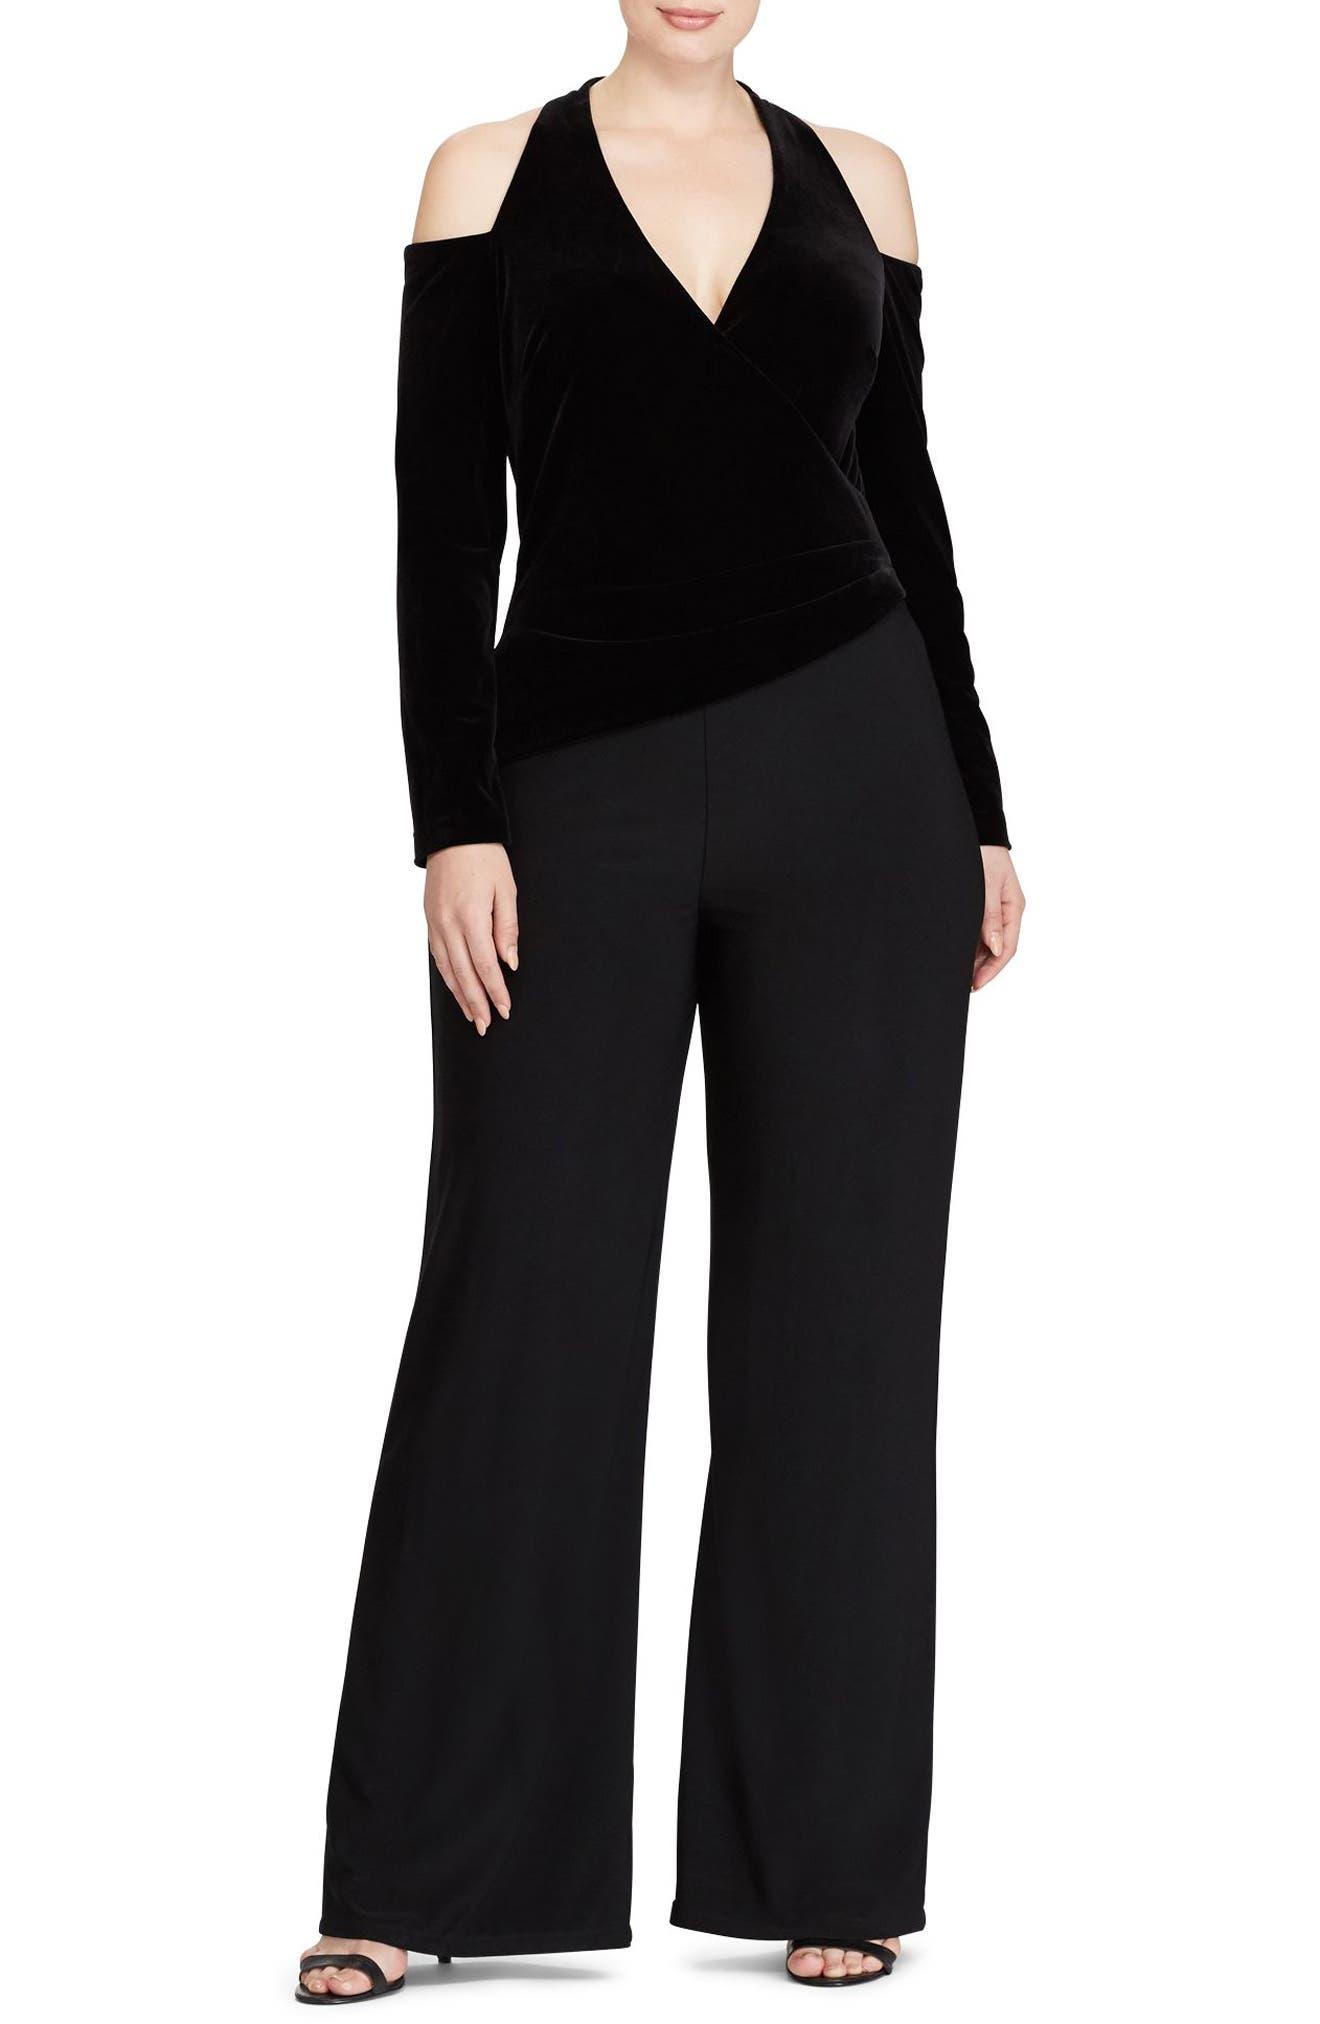 Alternate Image 1 Selected - Lauren Ralph Lauren Stretch Velvet & Jersey Jumpsuit (Plus Size)